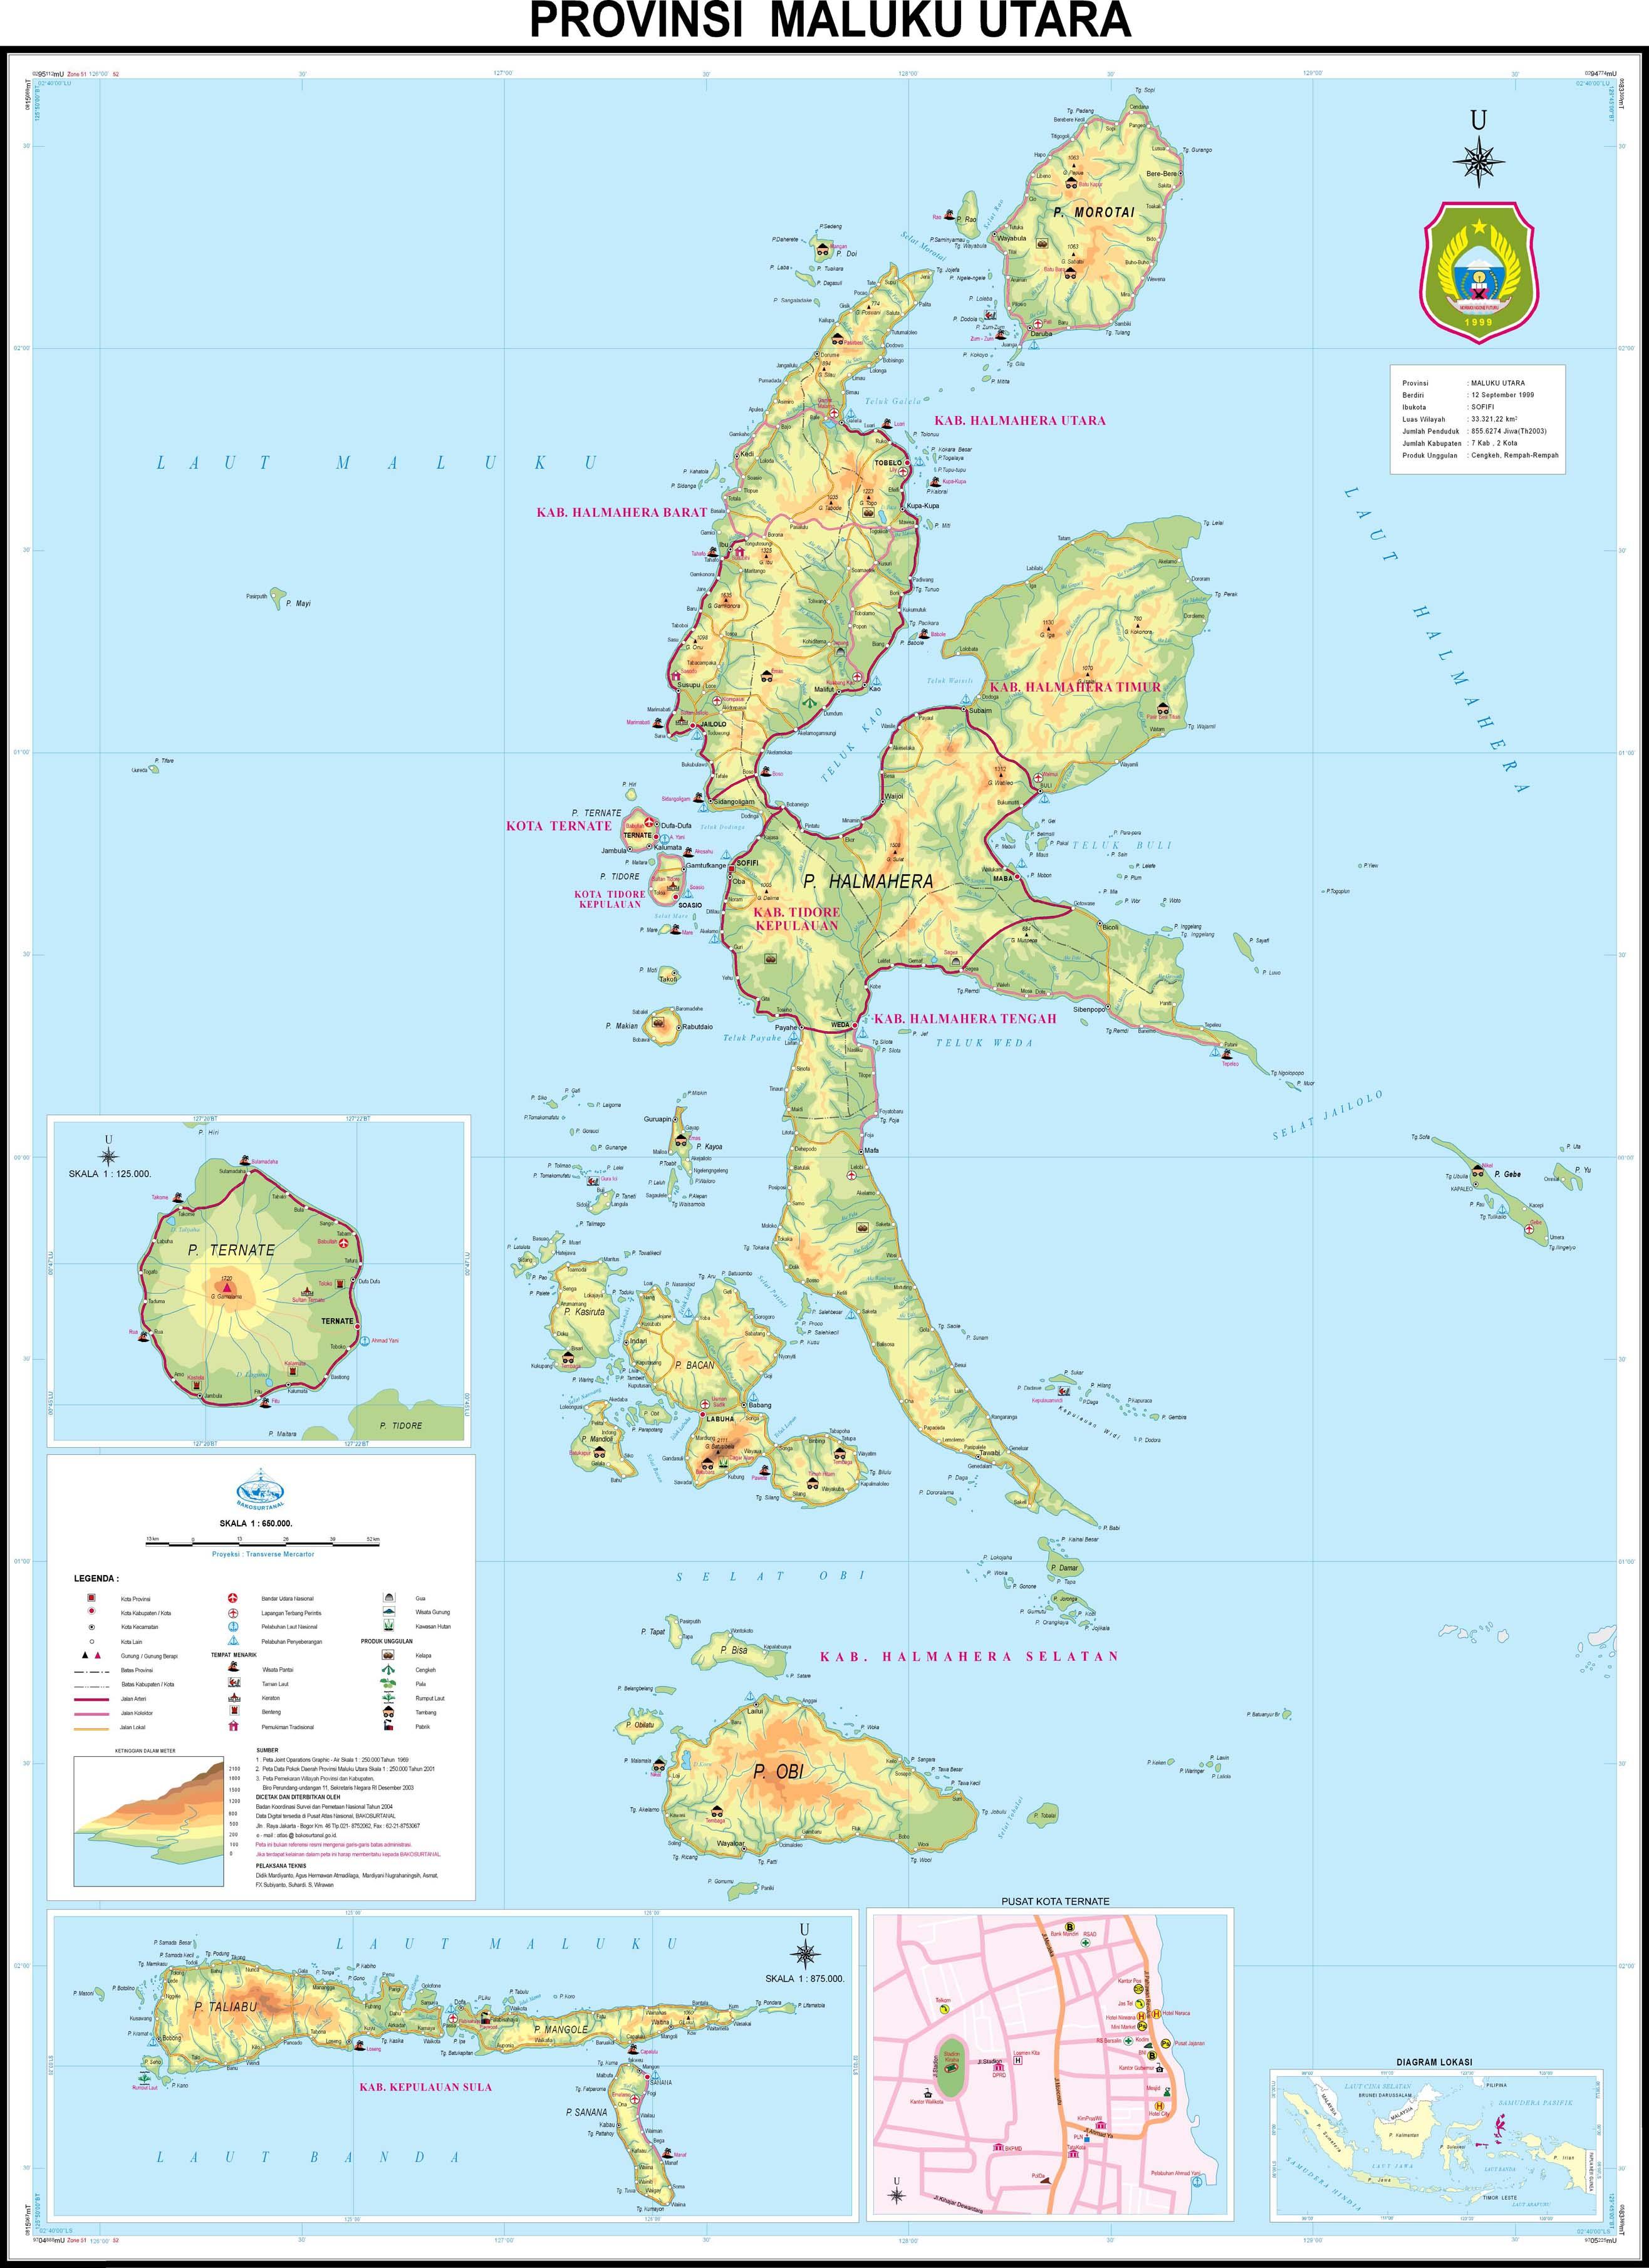 Simpan Gambar Peta Maluku Utara Foto